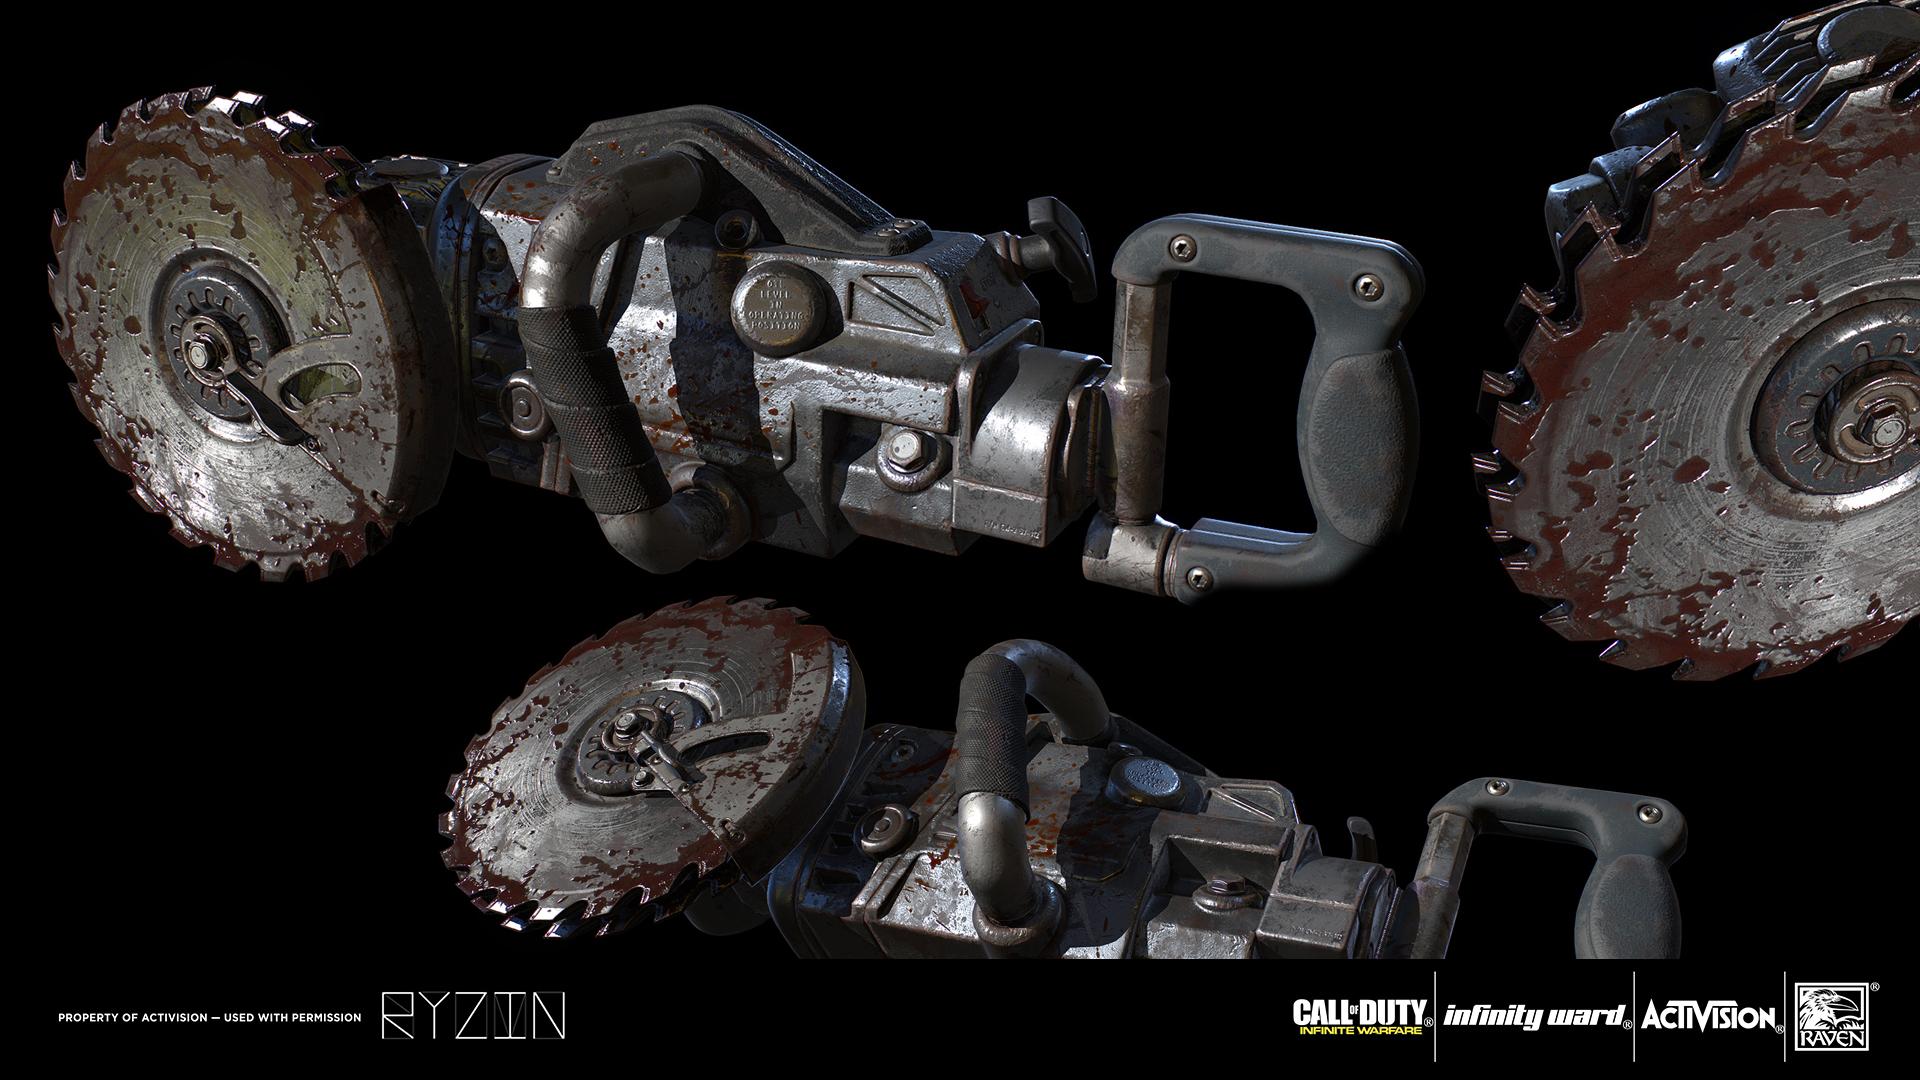 Chainsaw01.jpg